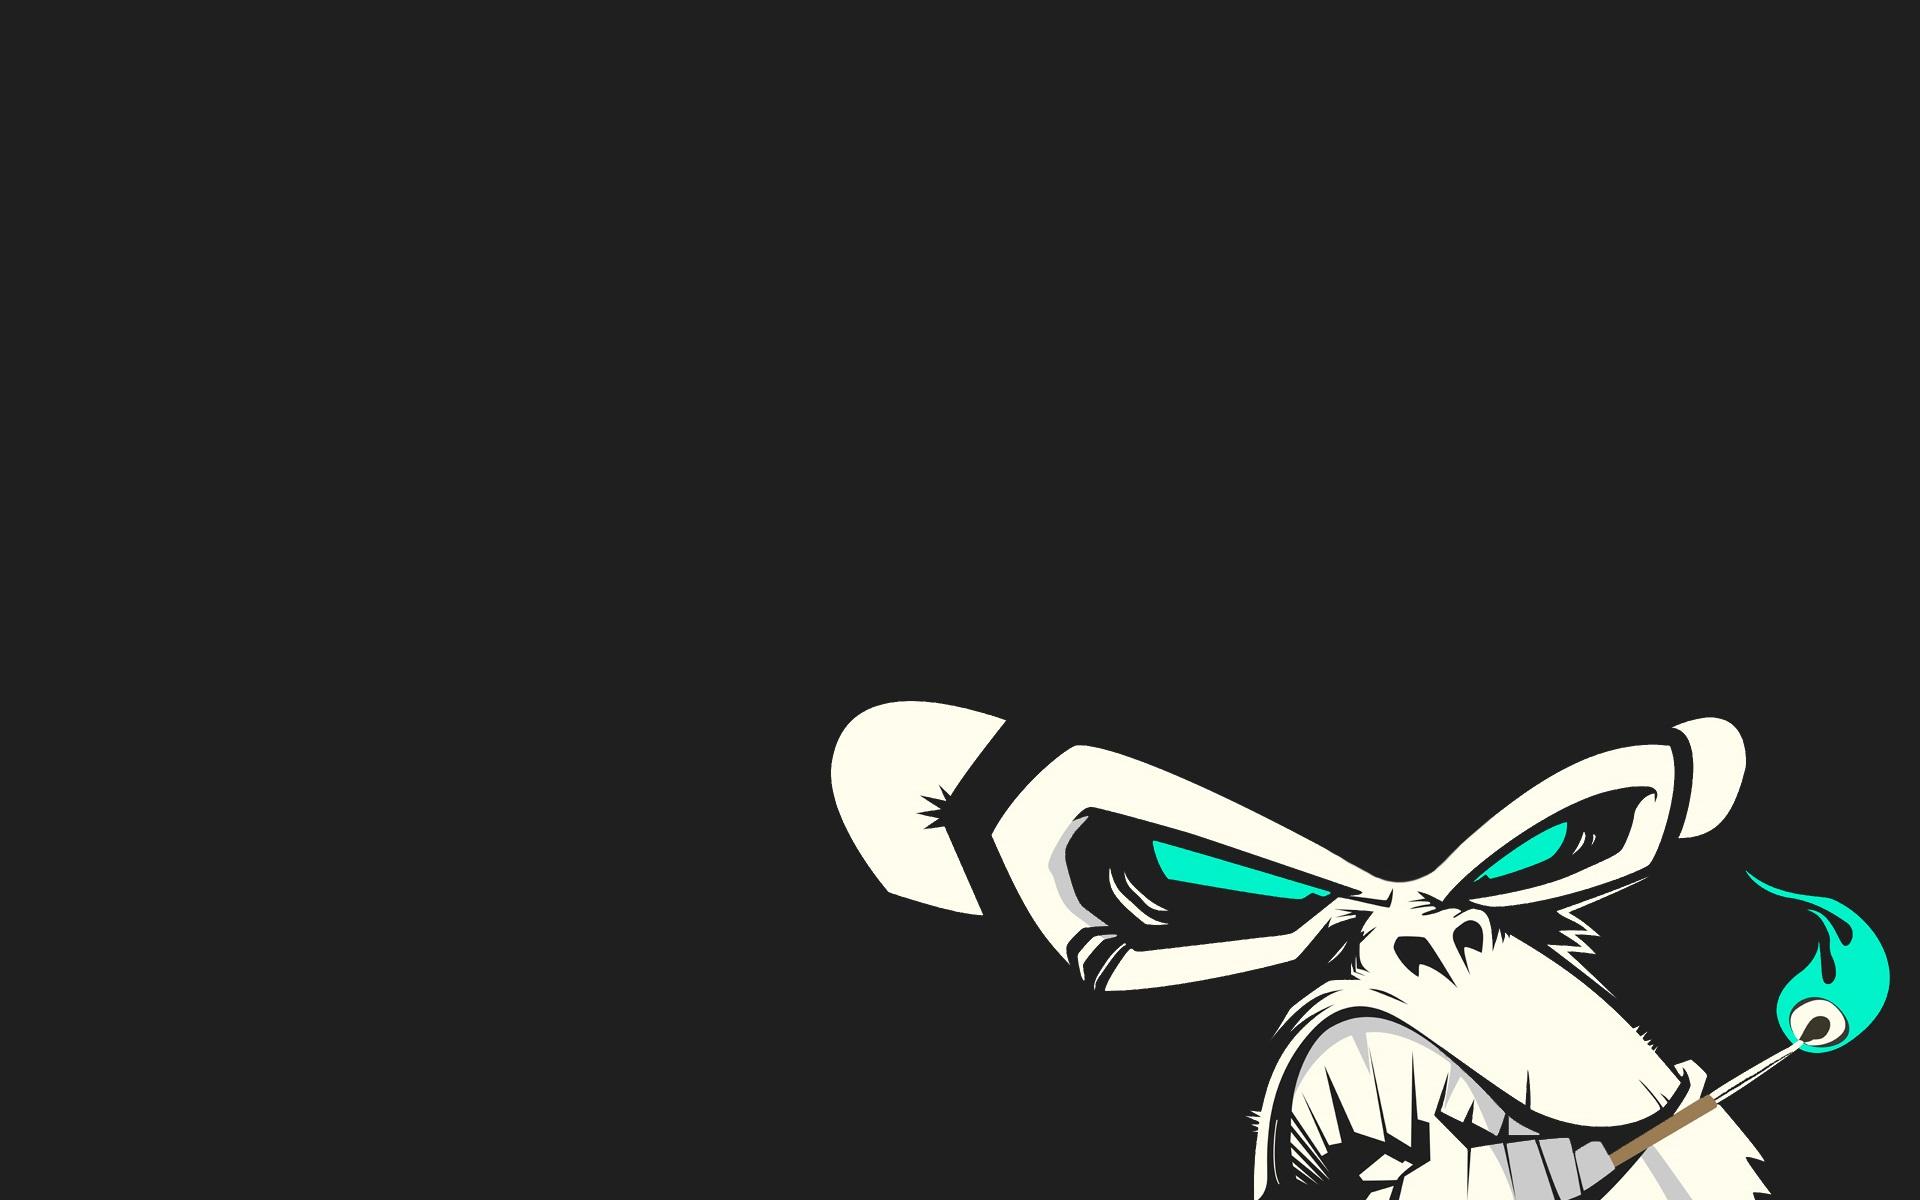 Evil Monkey   Cool Desktop Background 1920x1200